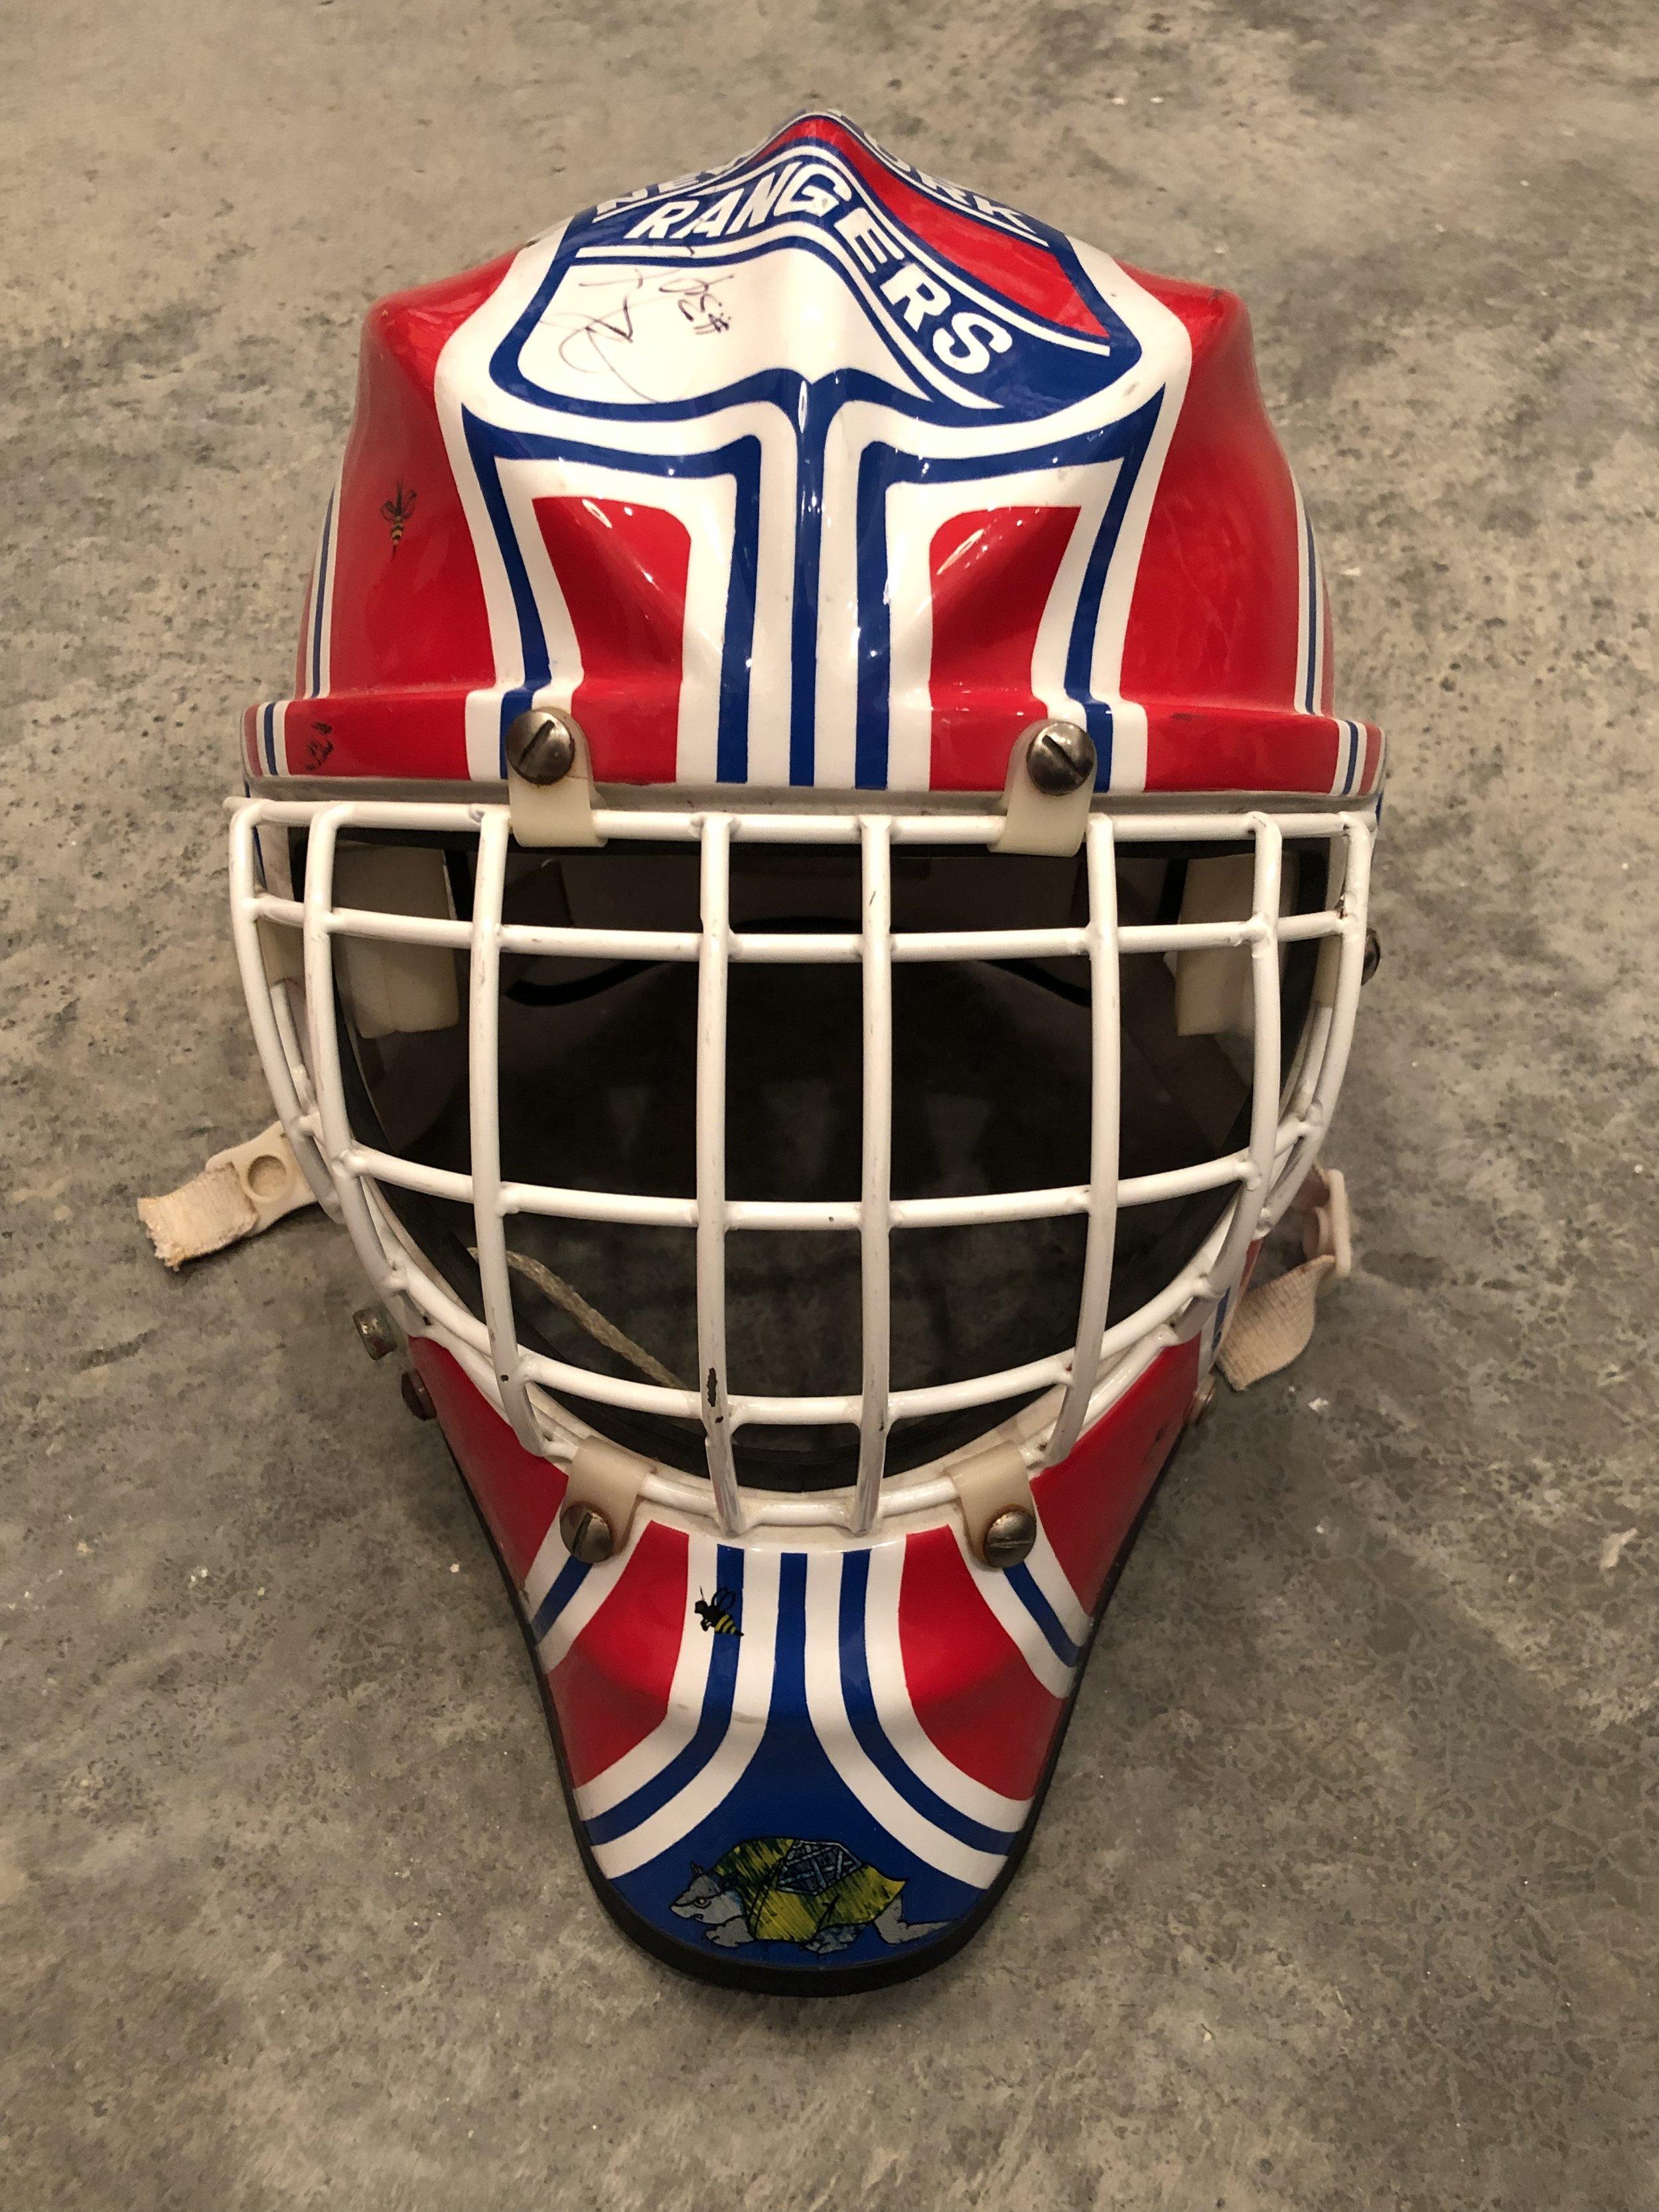 192-93 New York Rangers game worn mask